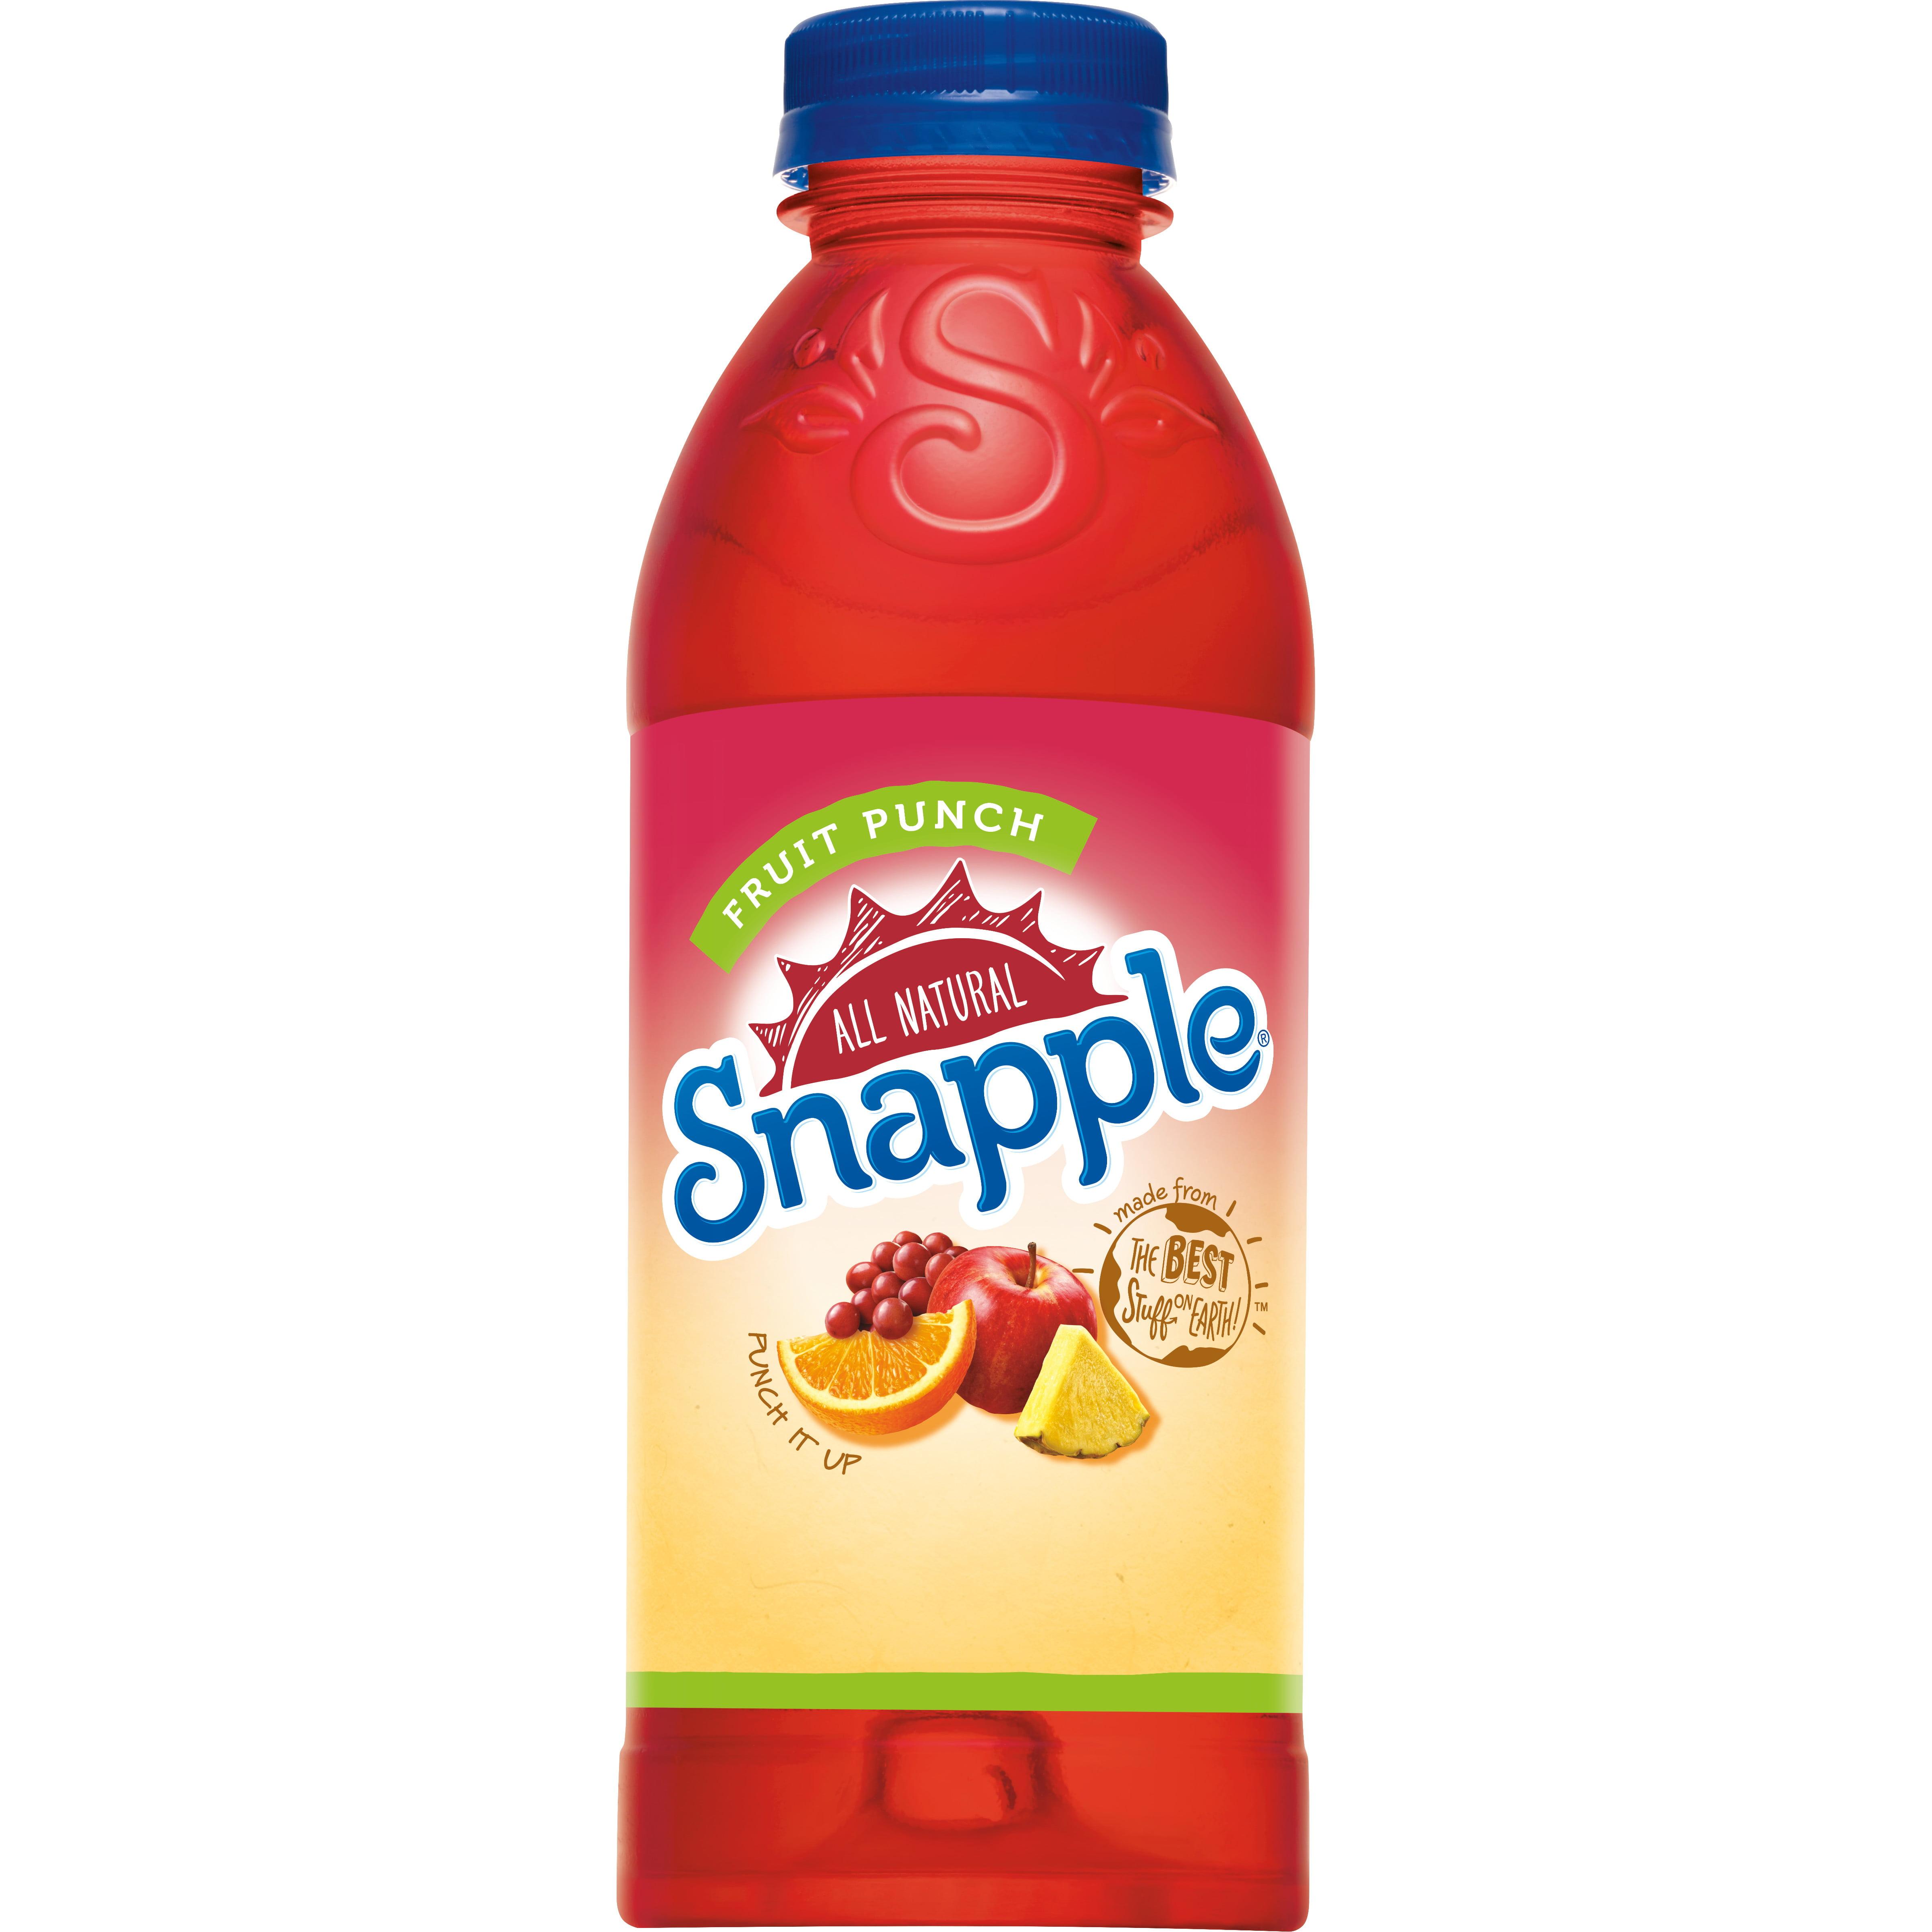 Snapple Fruit Punch, 20 fl oz